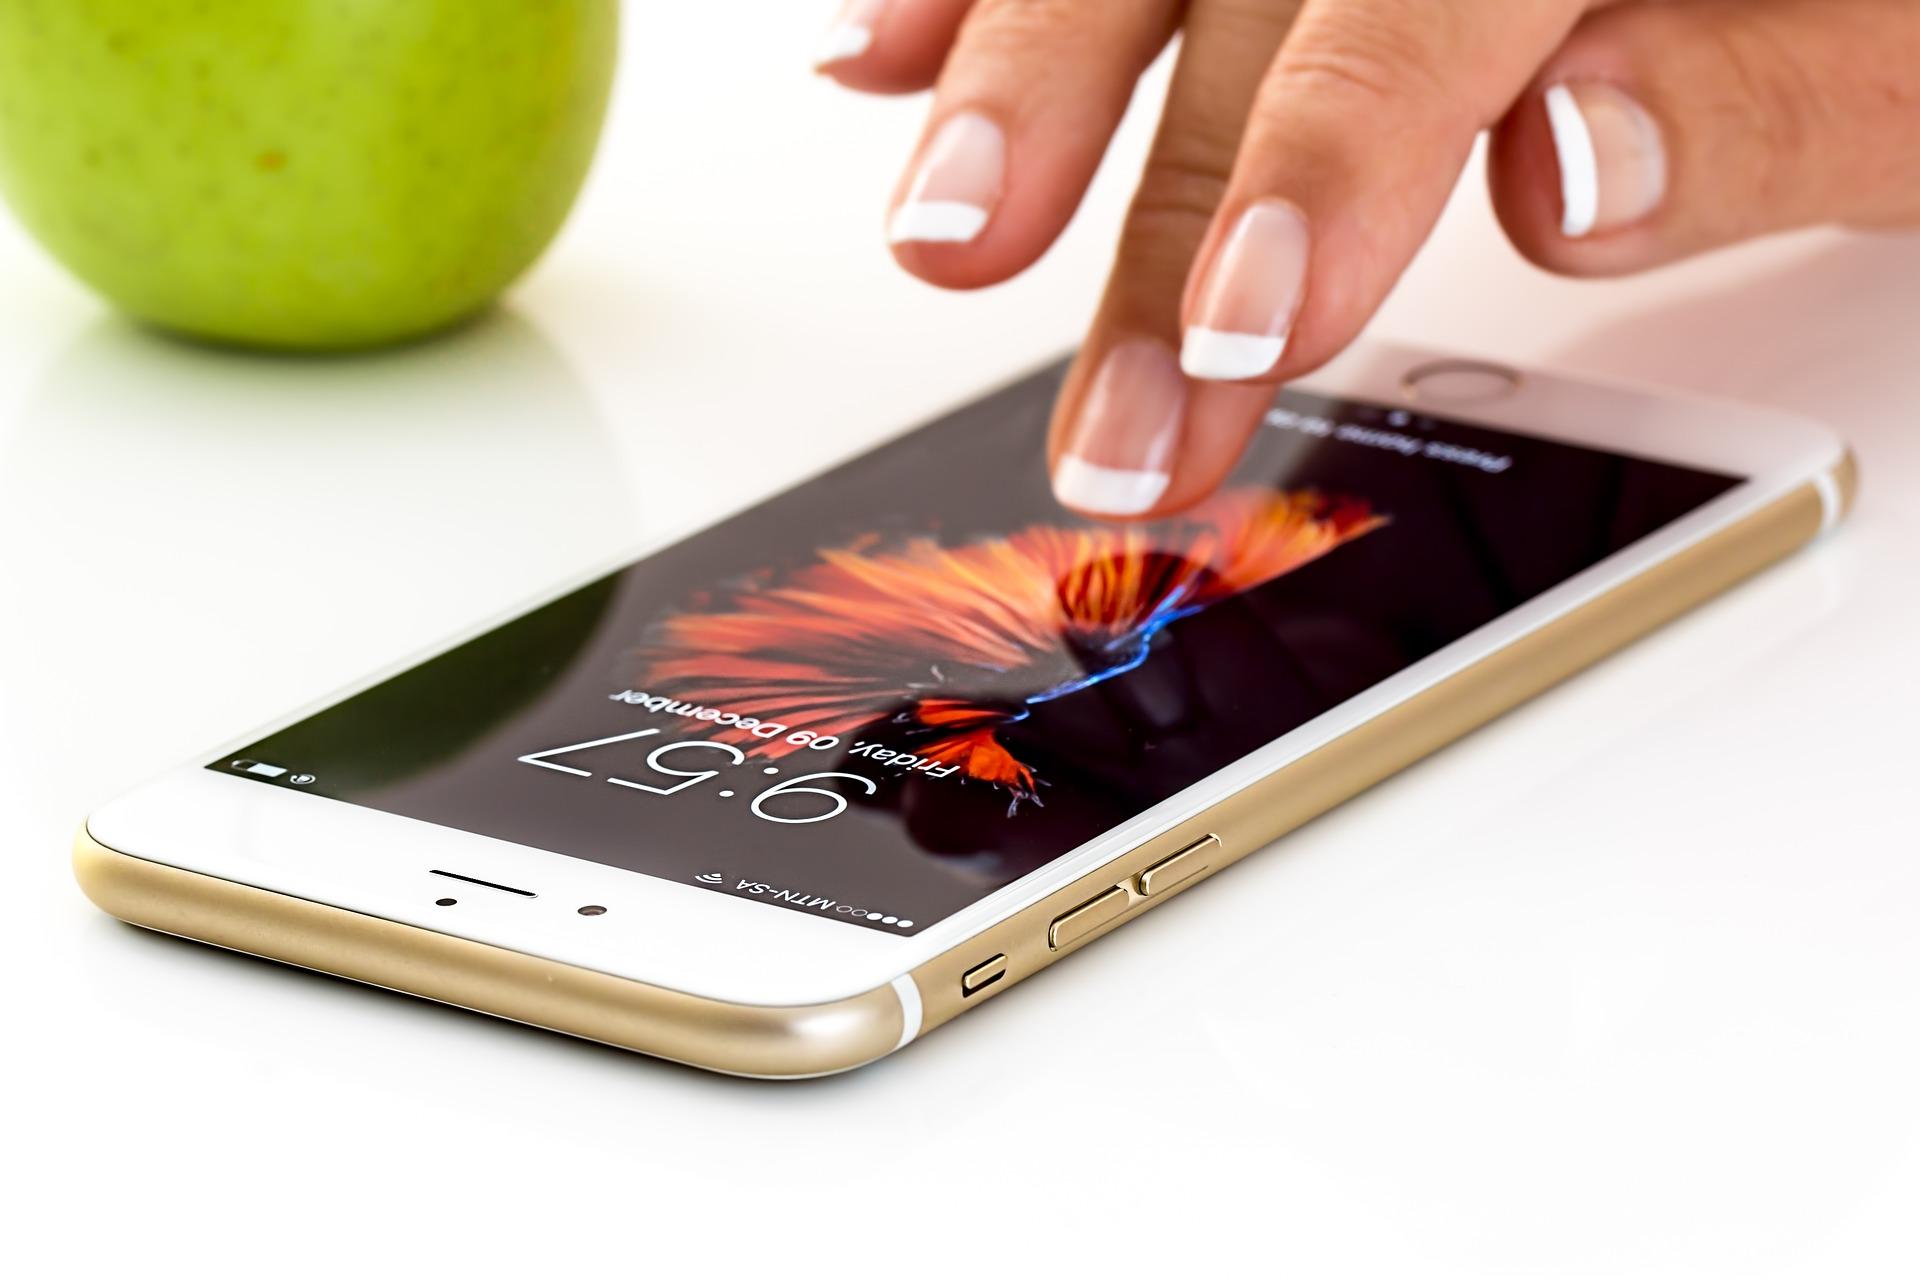 Dipendenza da smartphone, rimedi